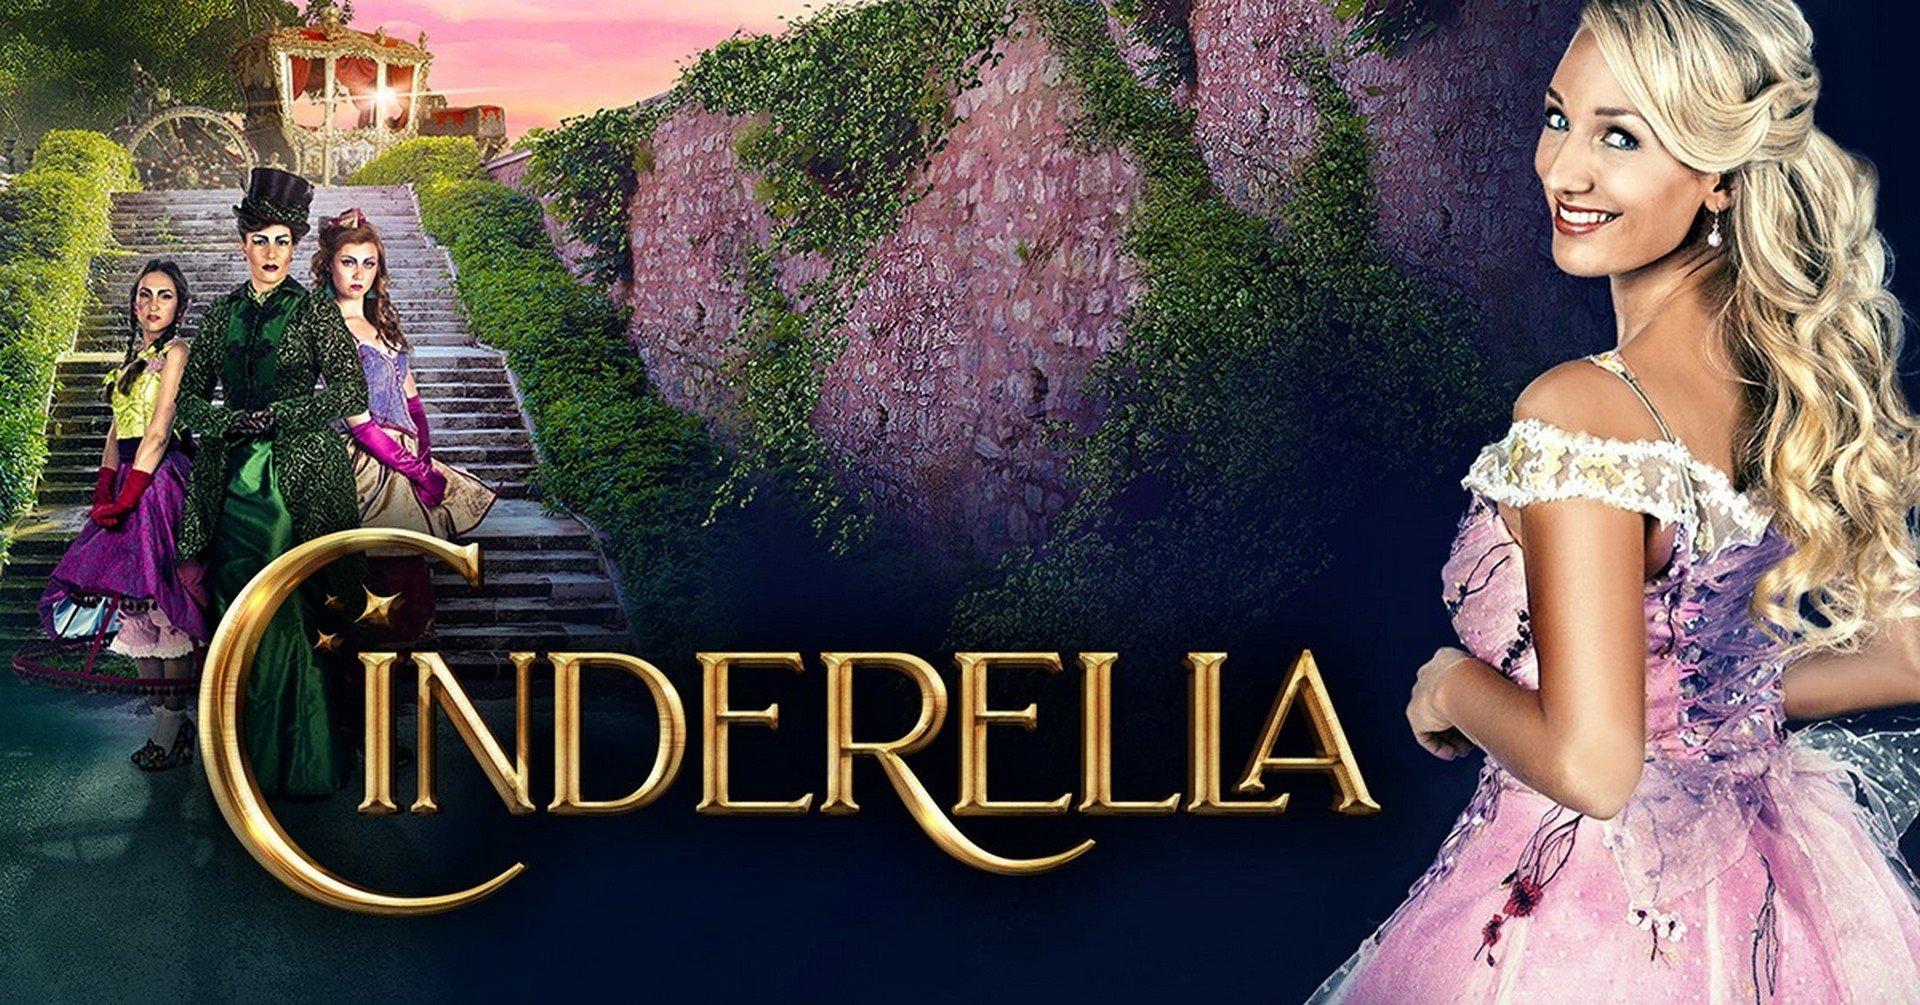 Pieter Casteleyn (Prins) en Roel Felius (vader Cinderella) vervolledigen hoofdcast 'Cinderella' - Cinderella 1